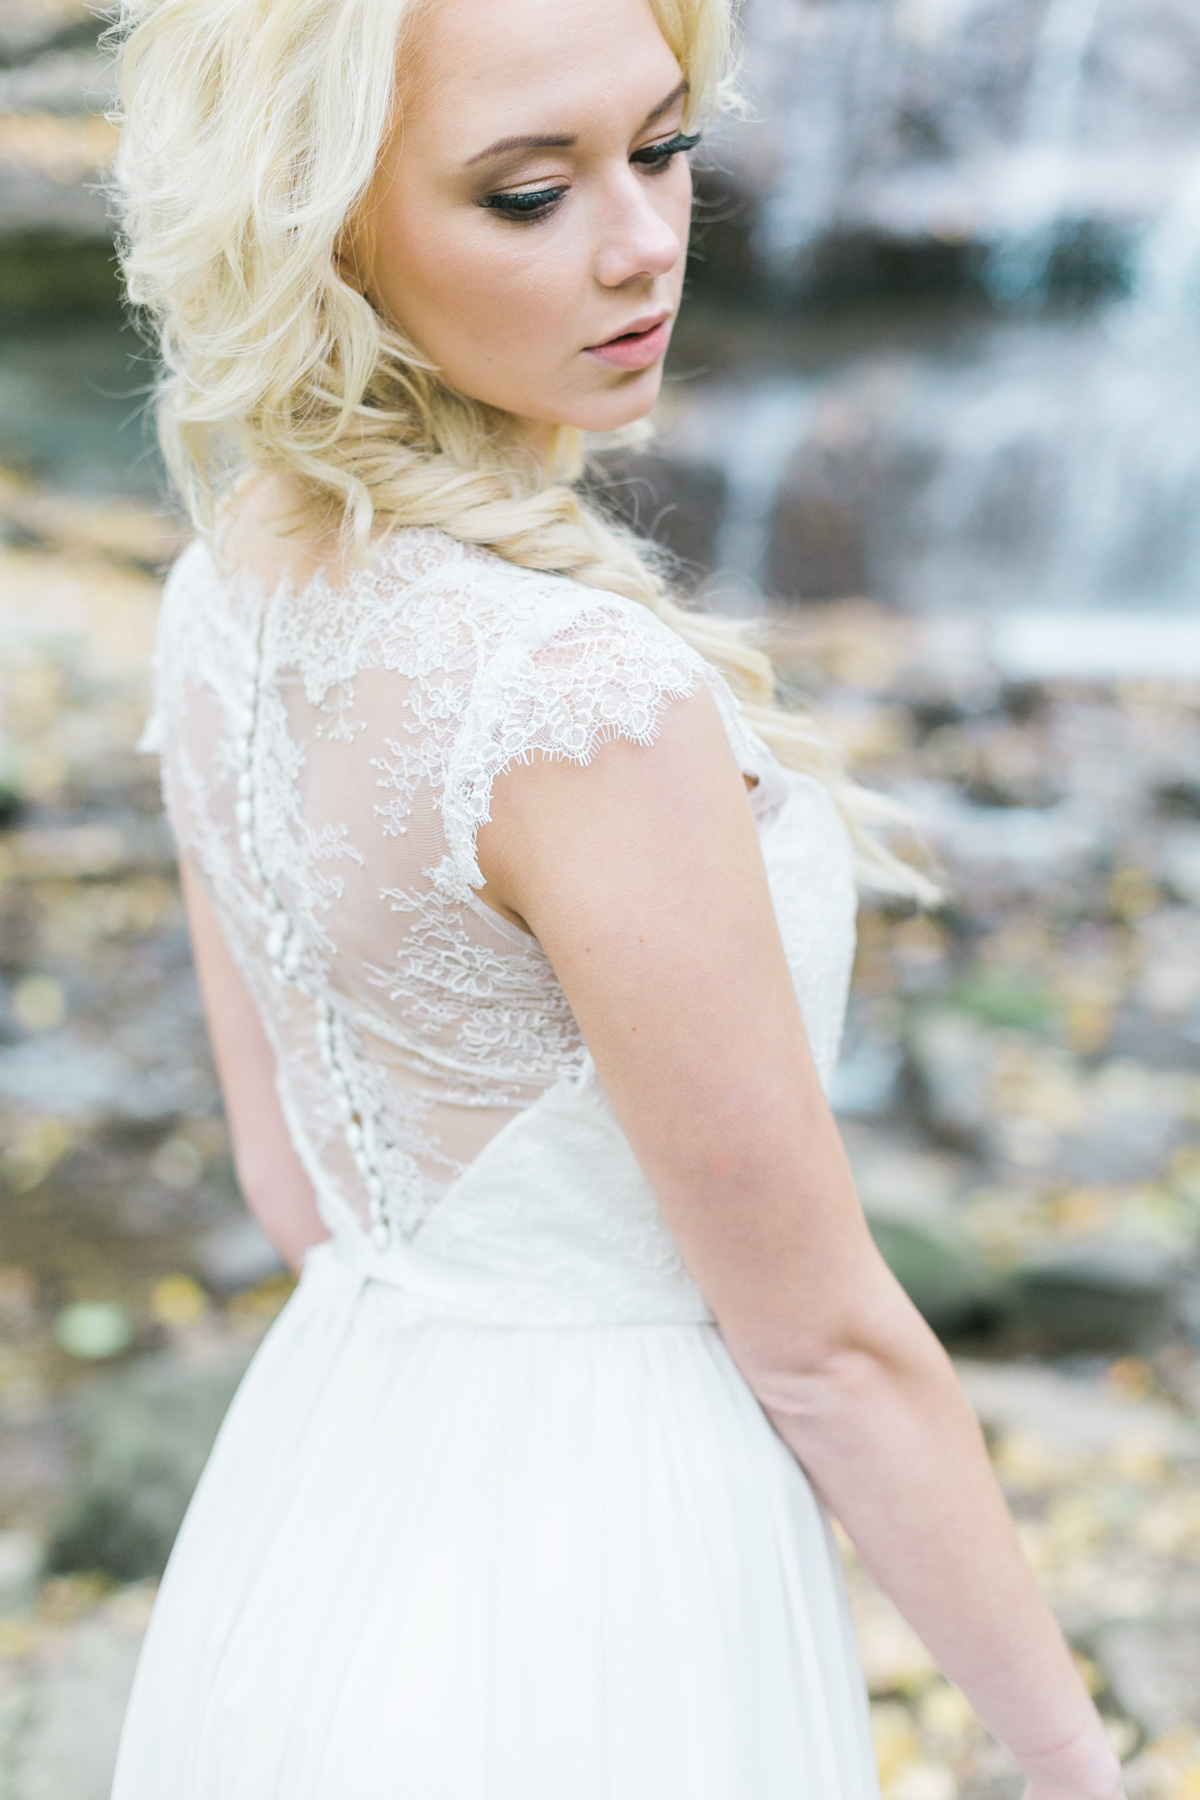 melissa-northcott-photography-vineyard-bride-swish-list-hamilton-waterfall-editorial-16.jpg